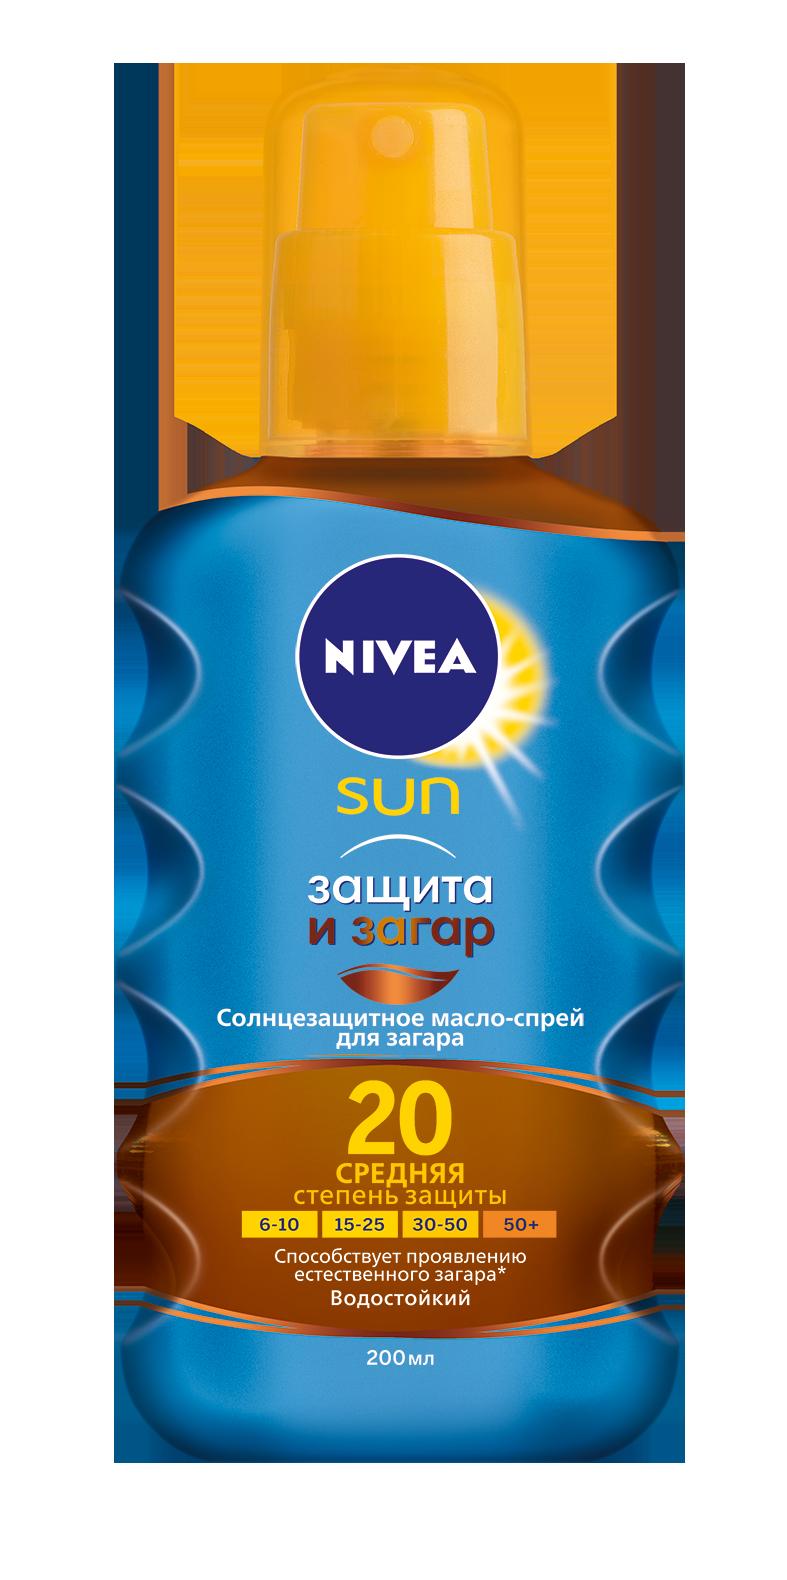 Нивея сан масло-спрей д/загара spf20 200мл (86037)